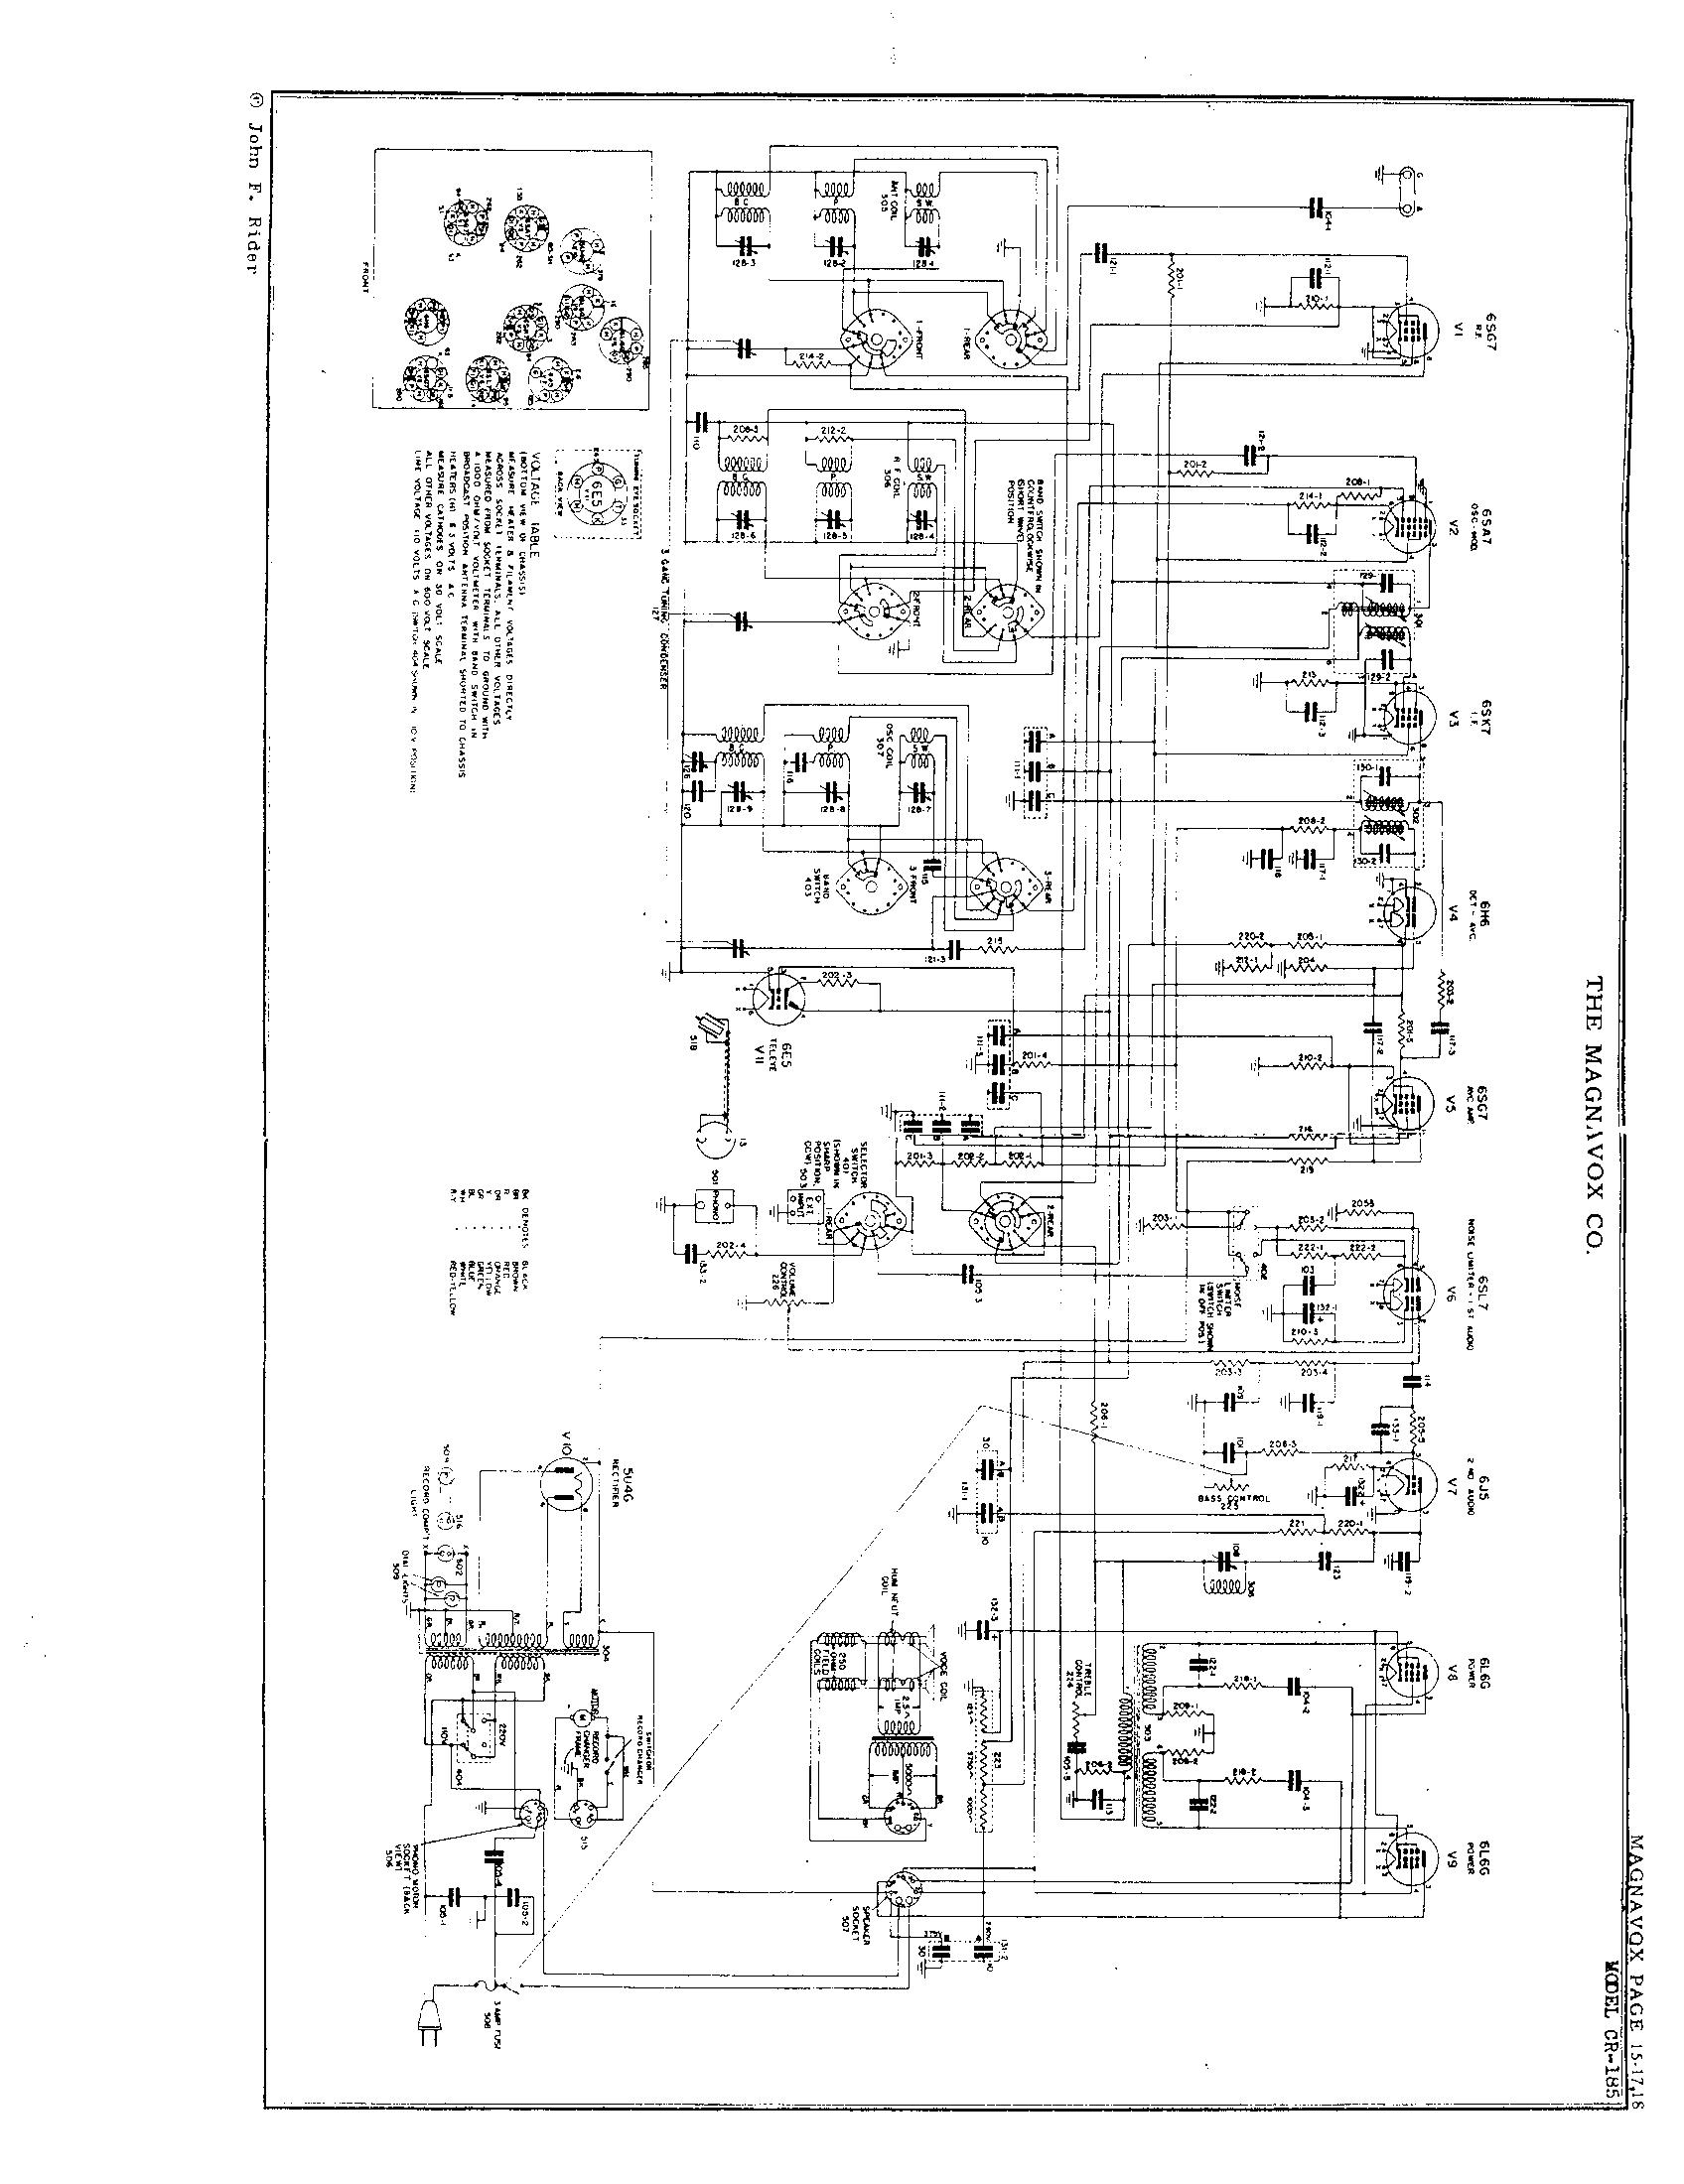 Magnavox Co Cr 183